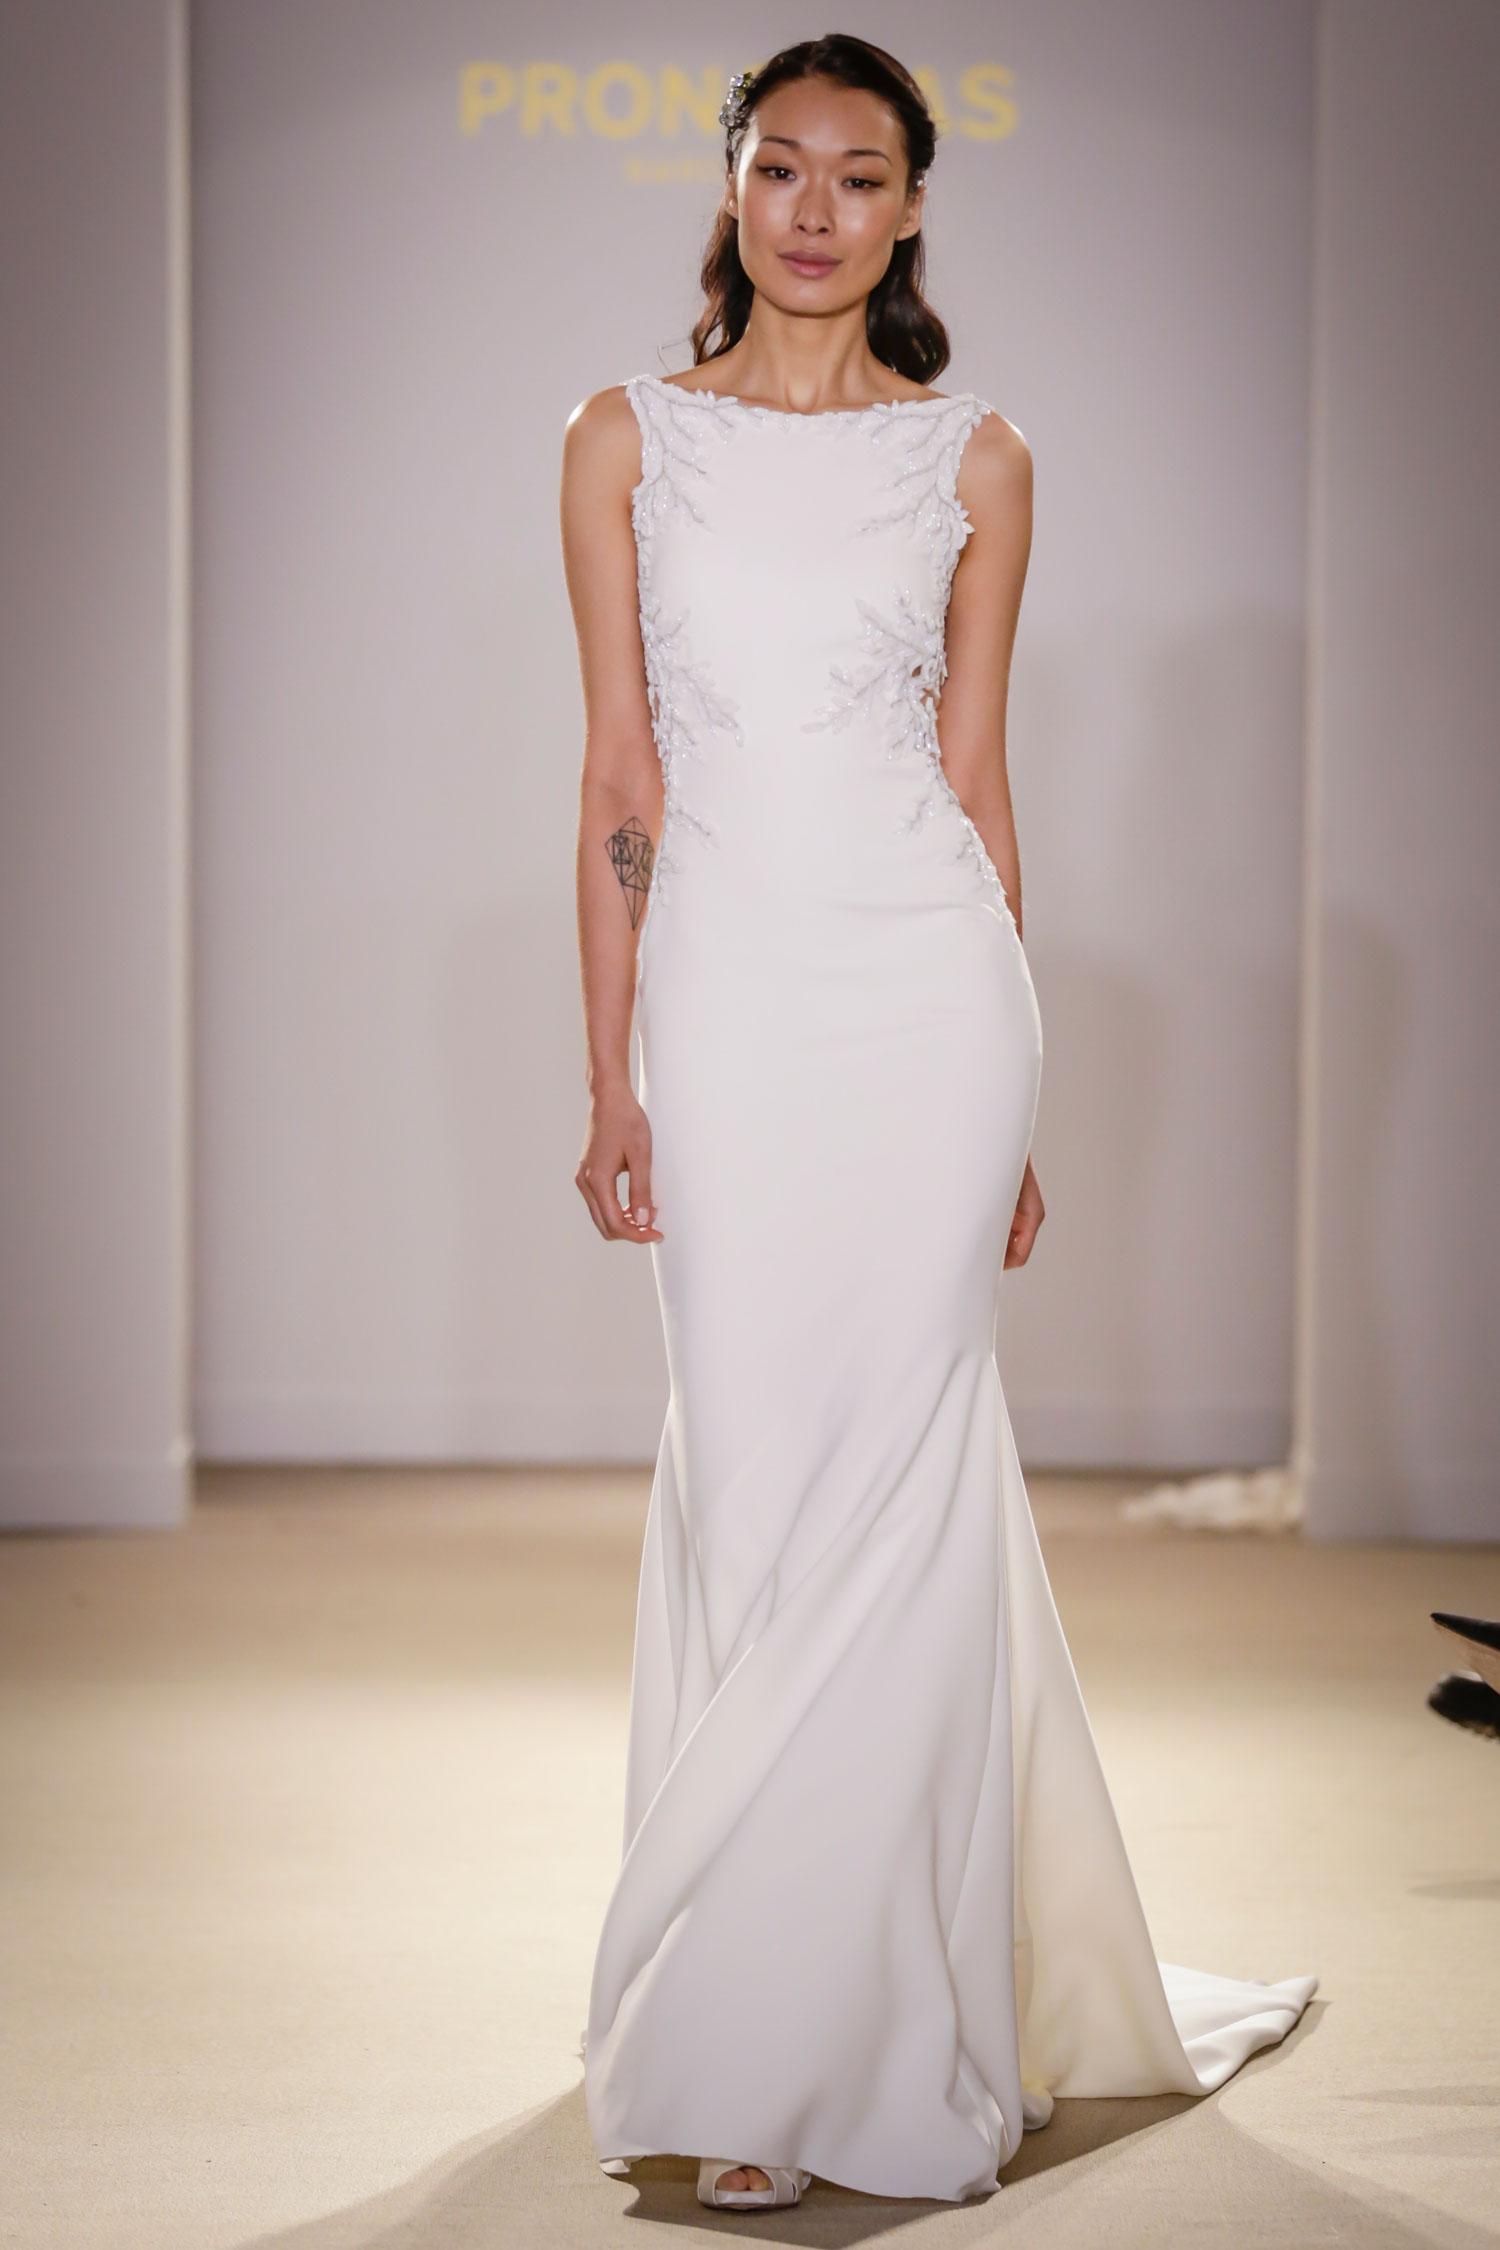 Pronovias high  neck bateau neckline wedding dress meghan markle bridal gown inspiration